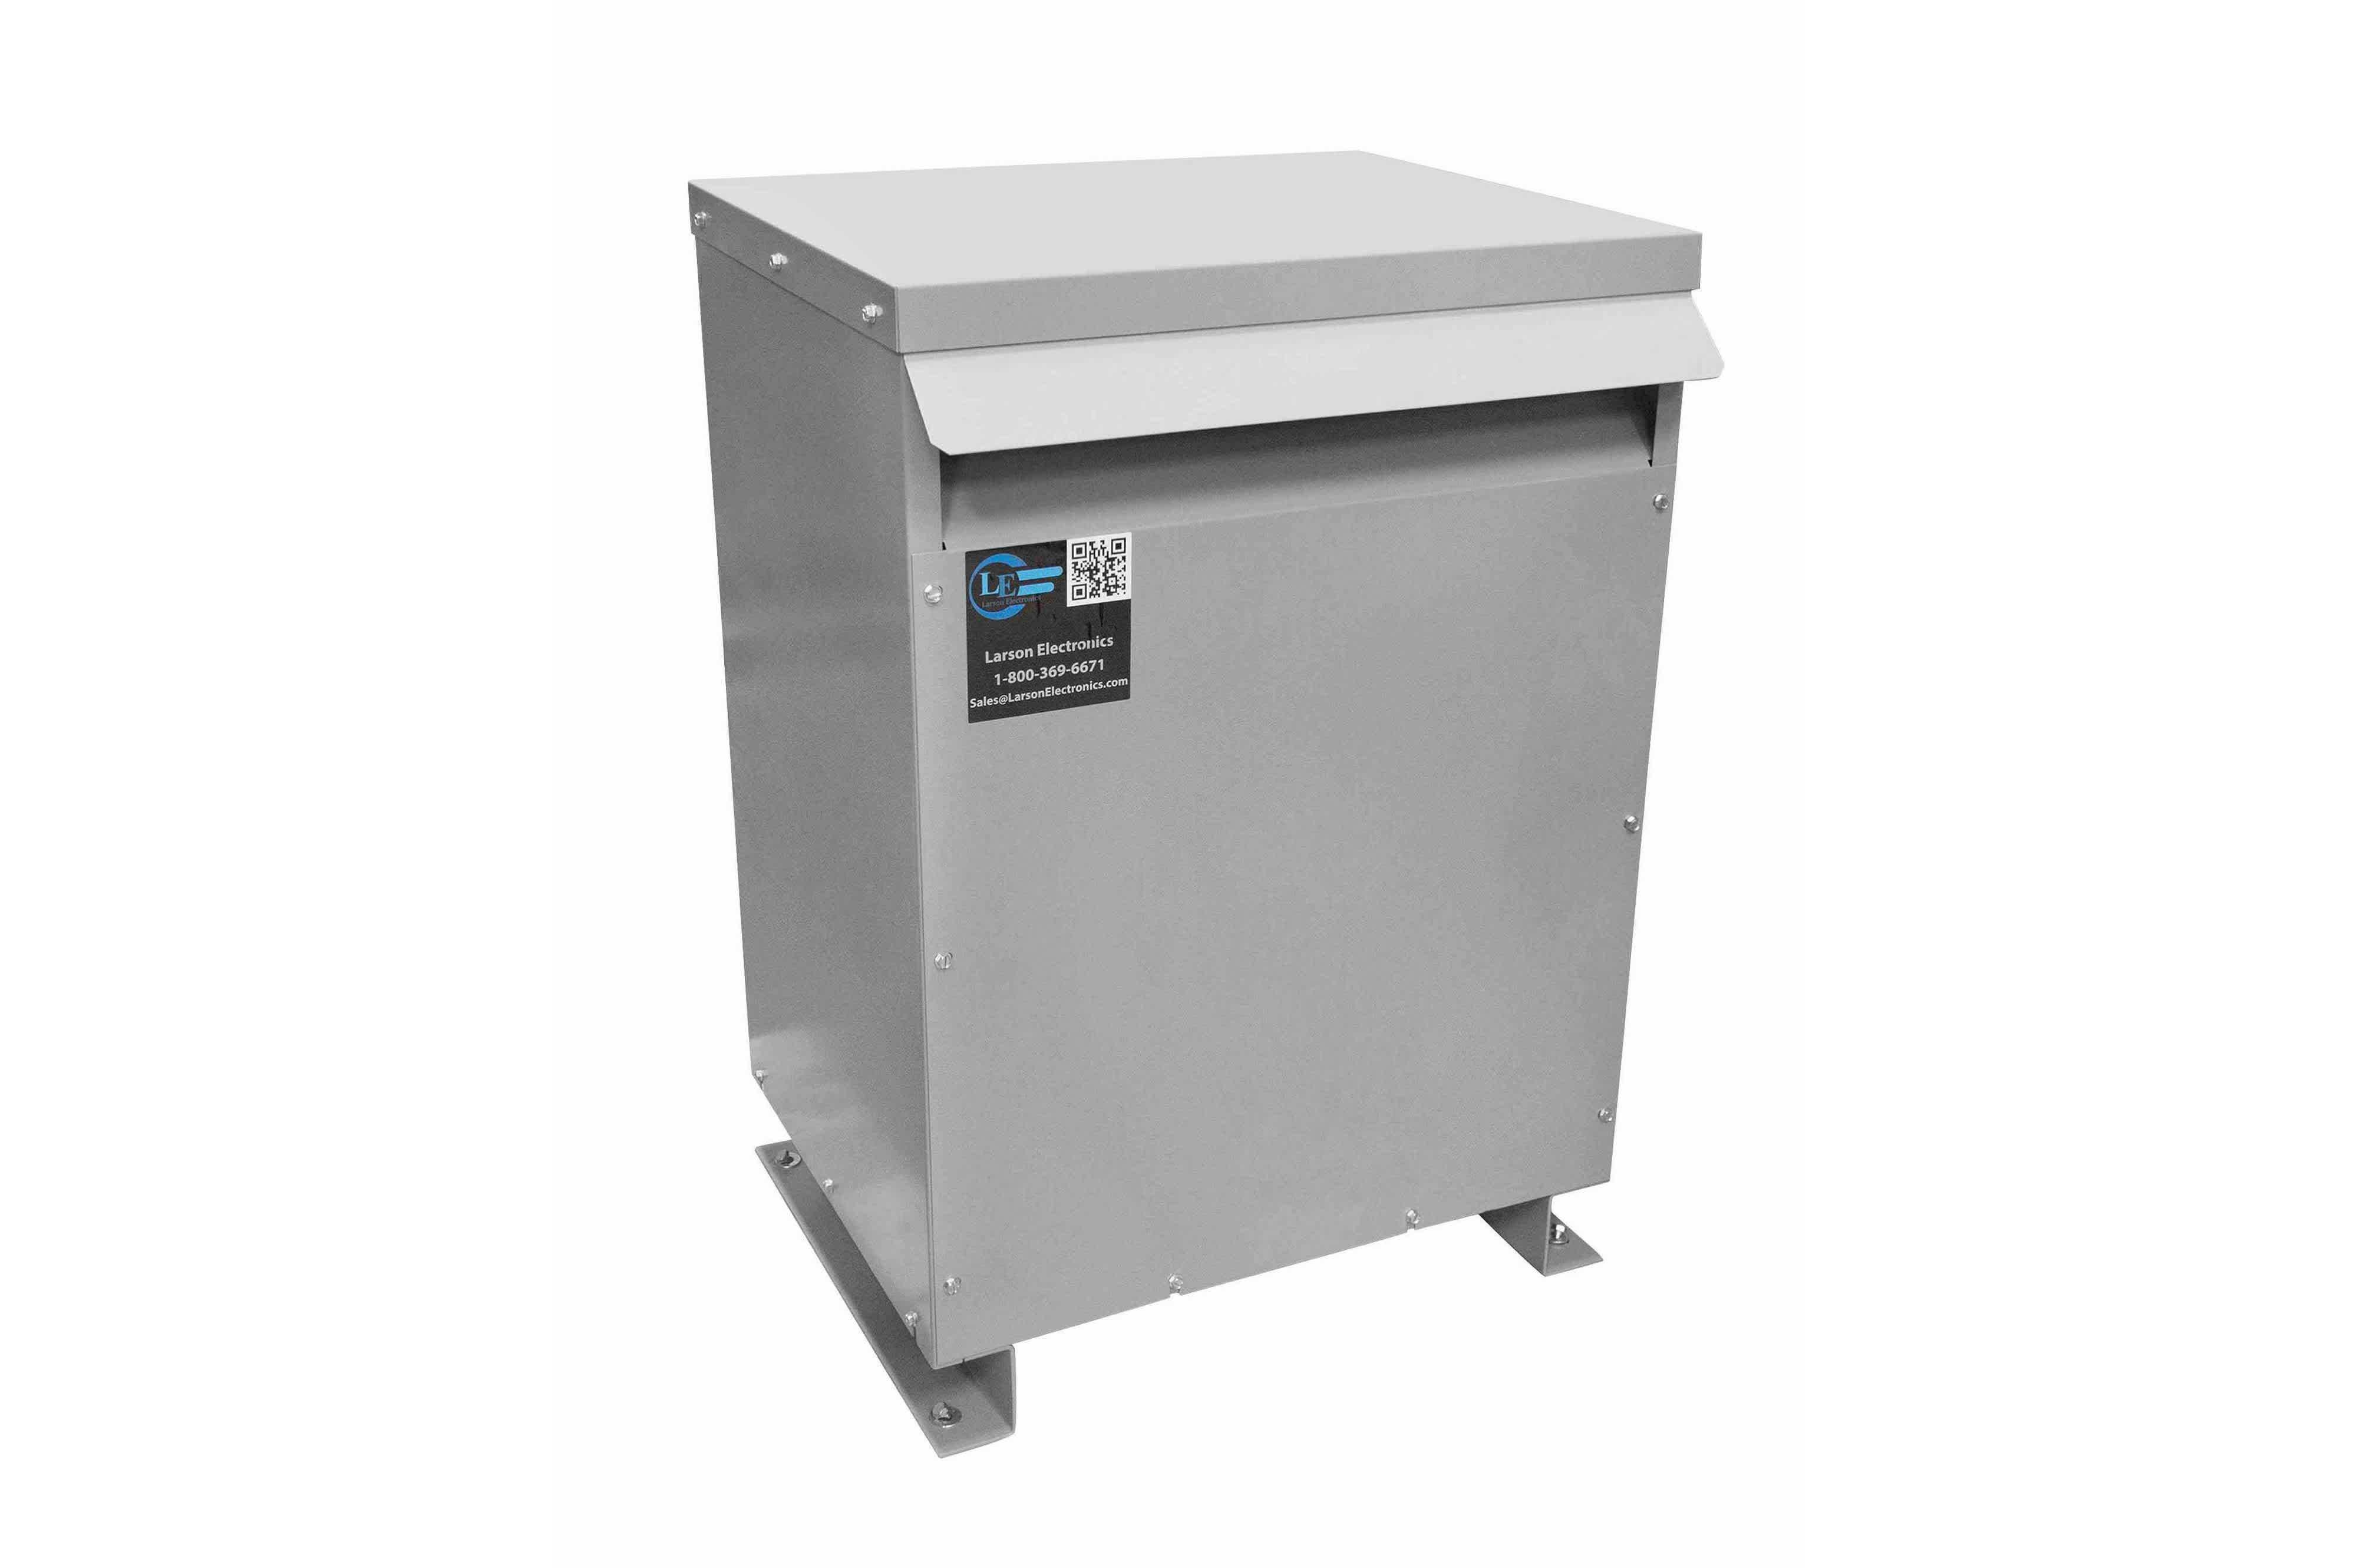 500 kVA 3PH Isolation Transformer, 460V Wye Primary, 415Y/240 Wye-N Secondary, N3R, Ventilated, 60 Hz